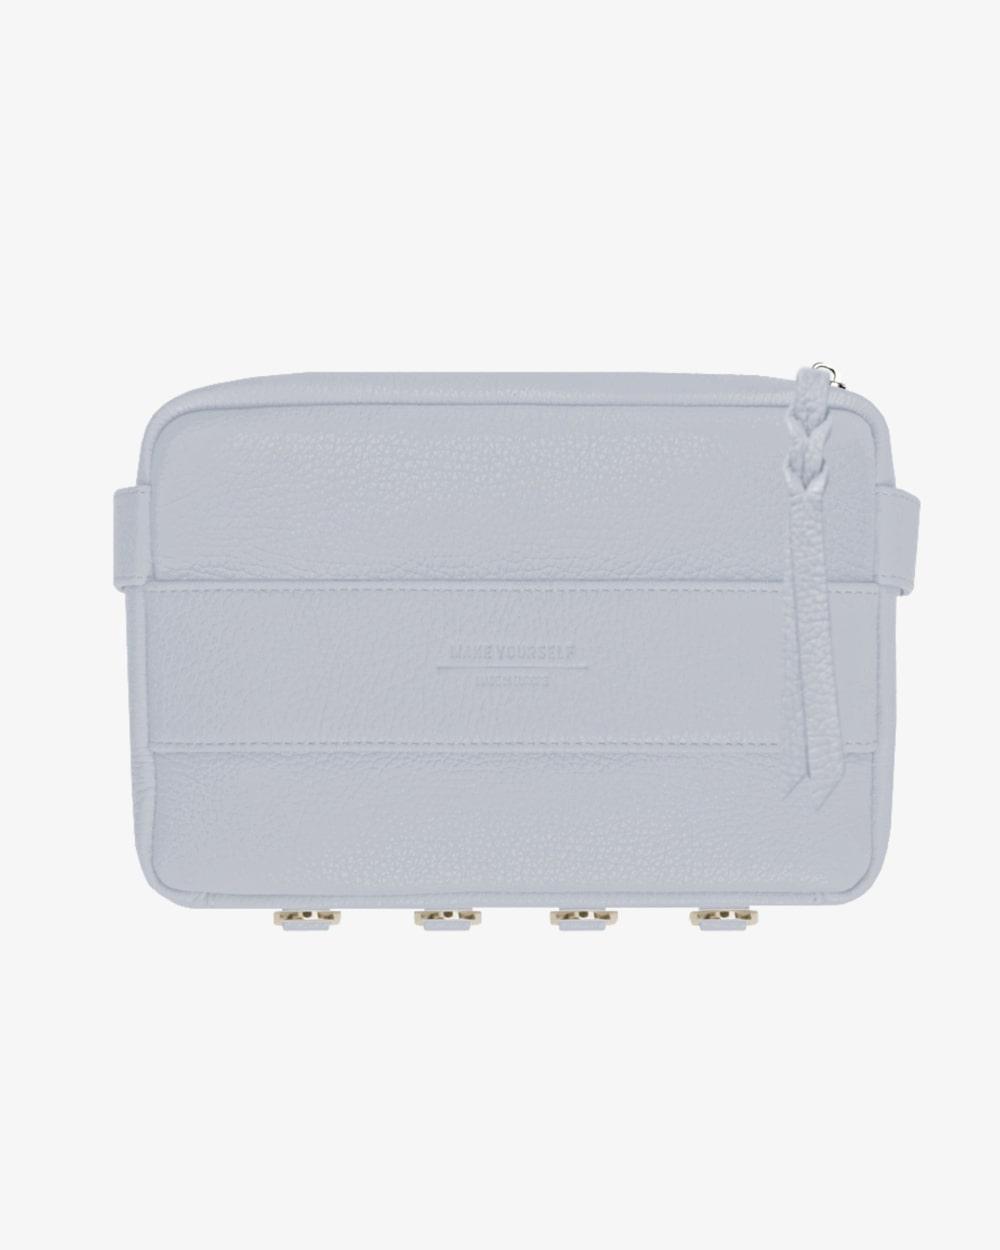 cube cloudy gray torebka personalizowana make yourself